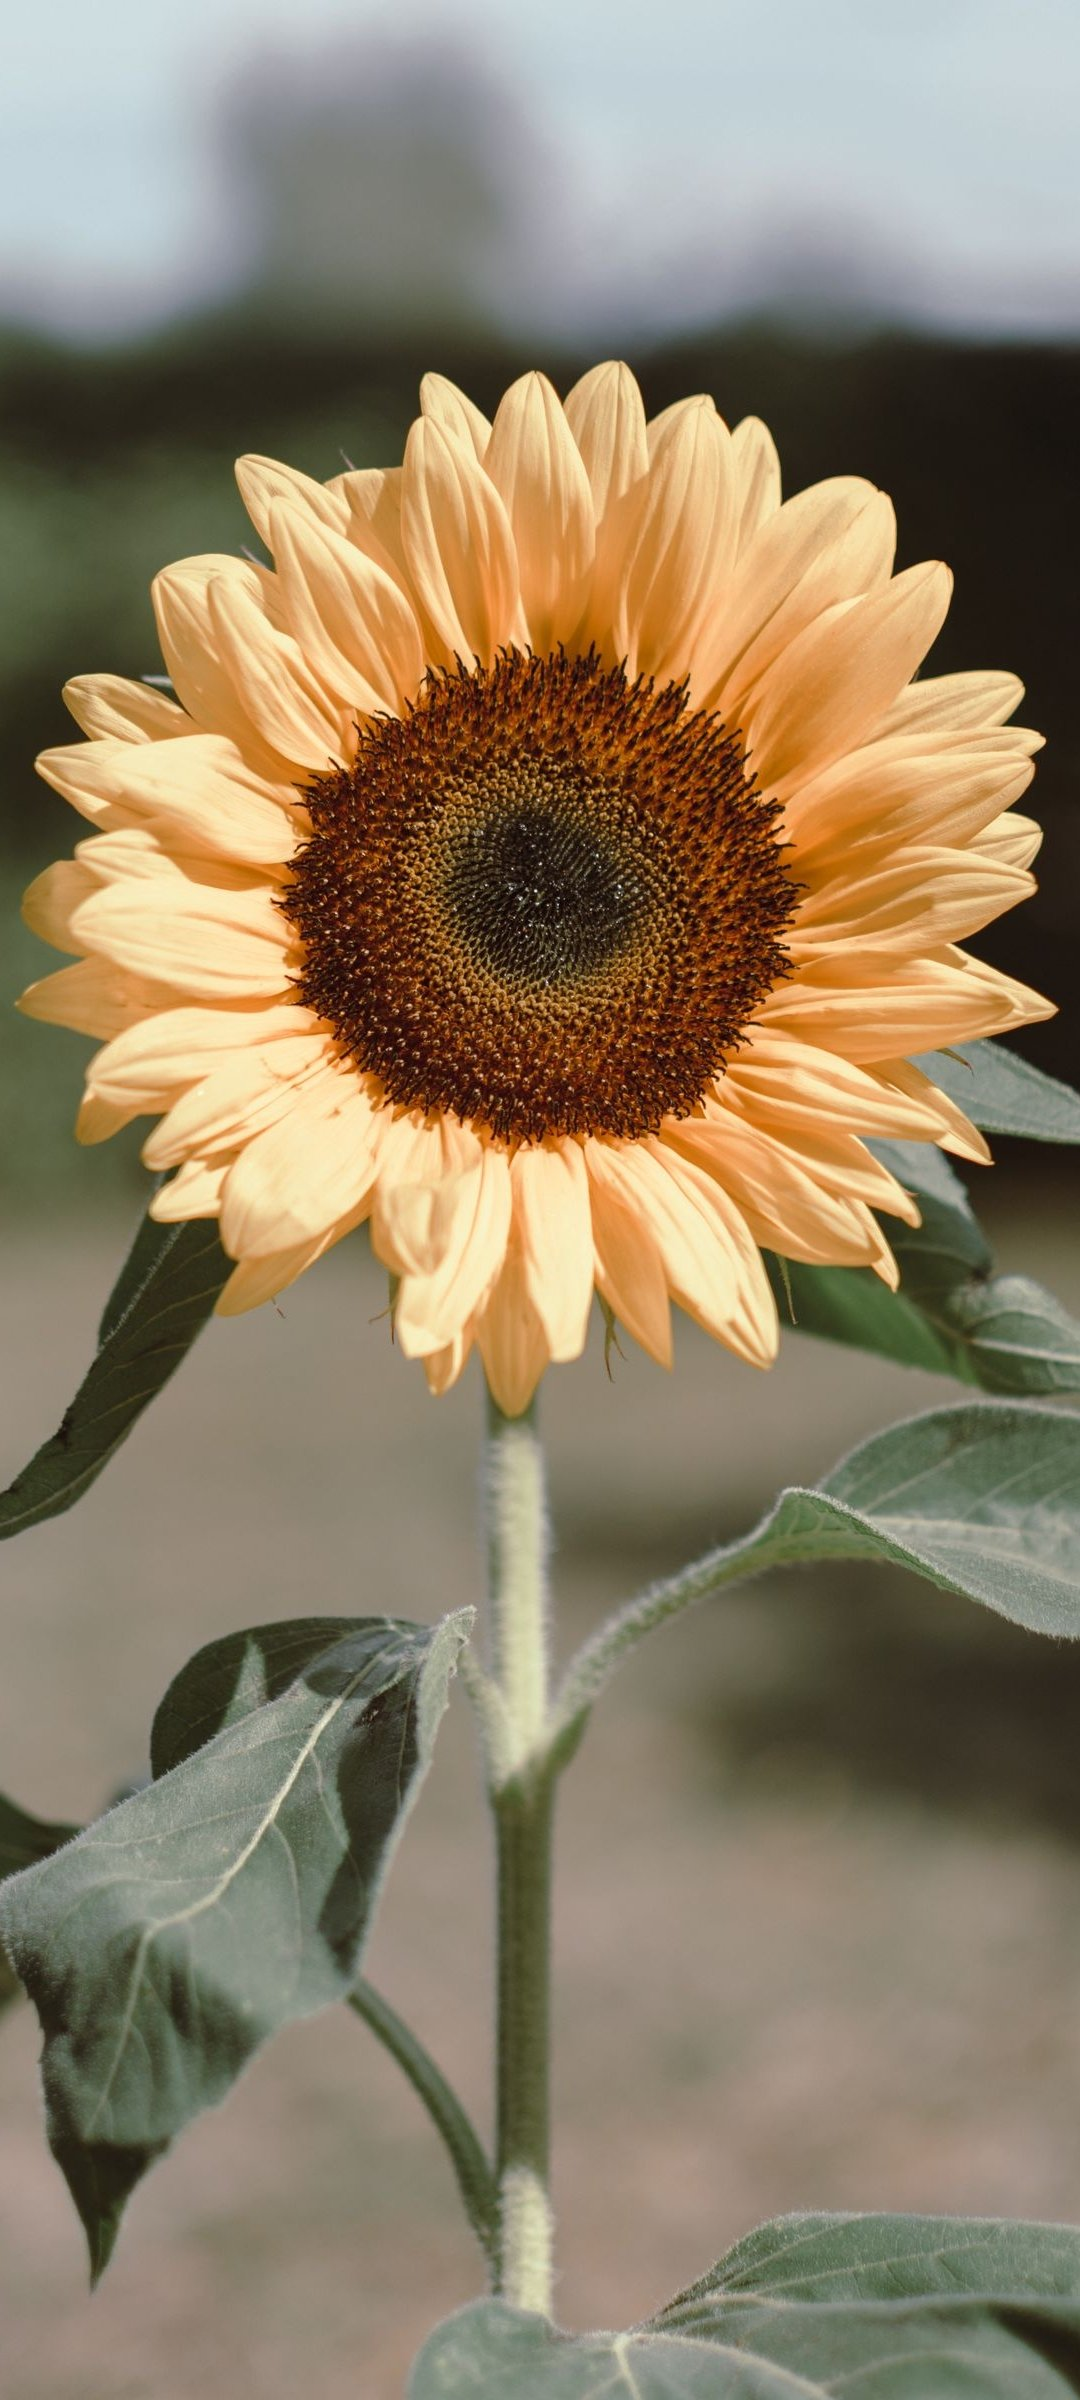 Yellow Sunflower Wallpaper - 44